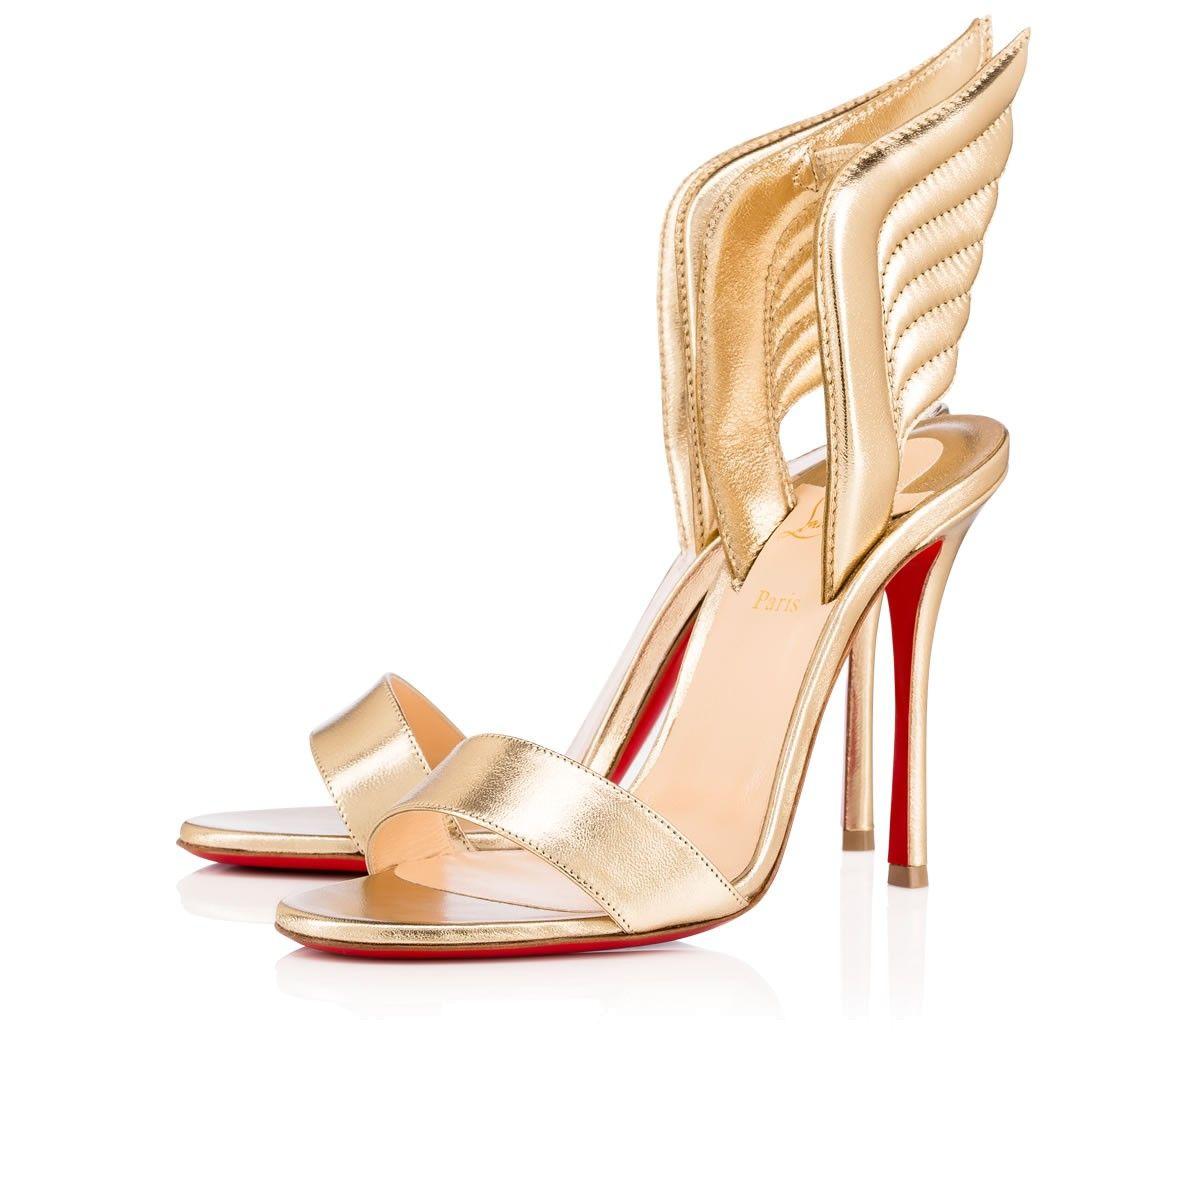 Samotresse 100 Light Gold Nappa - Women Shoes - Christian Louboutin